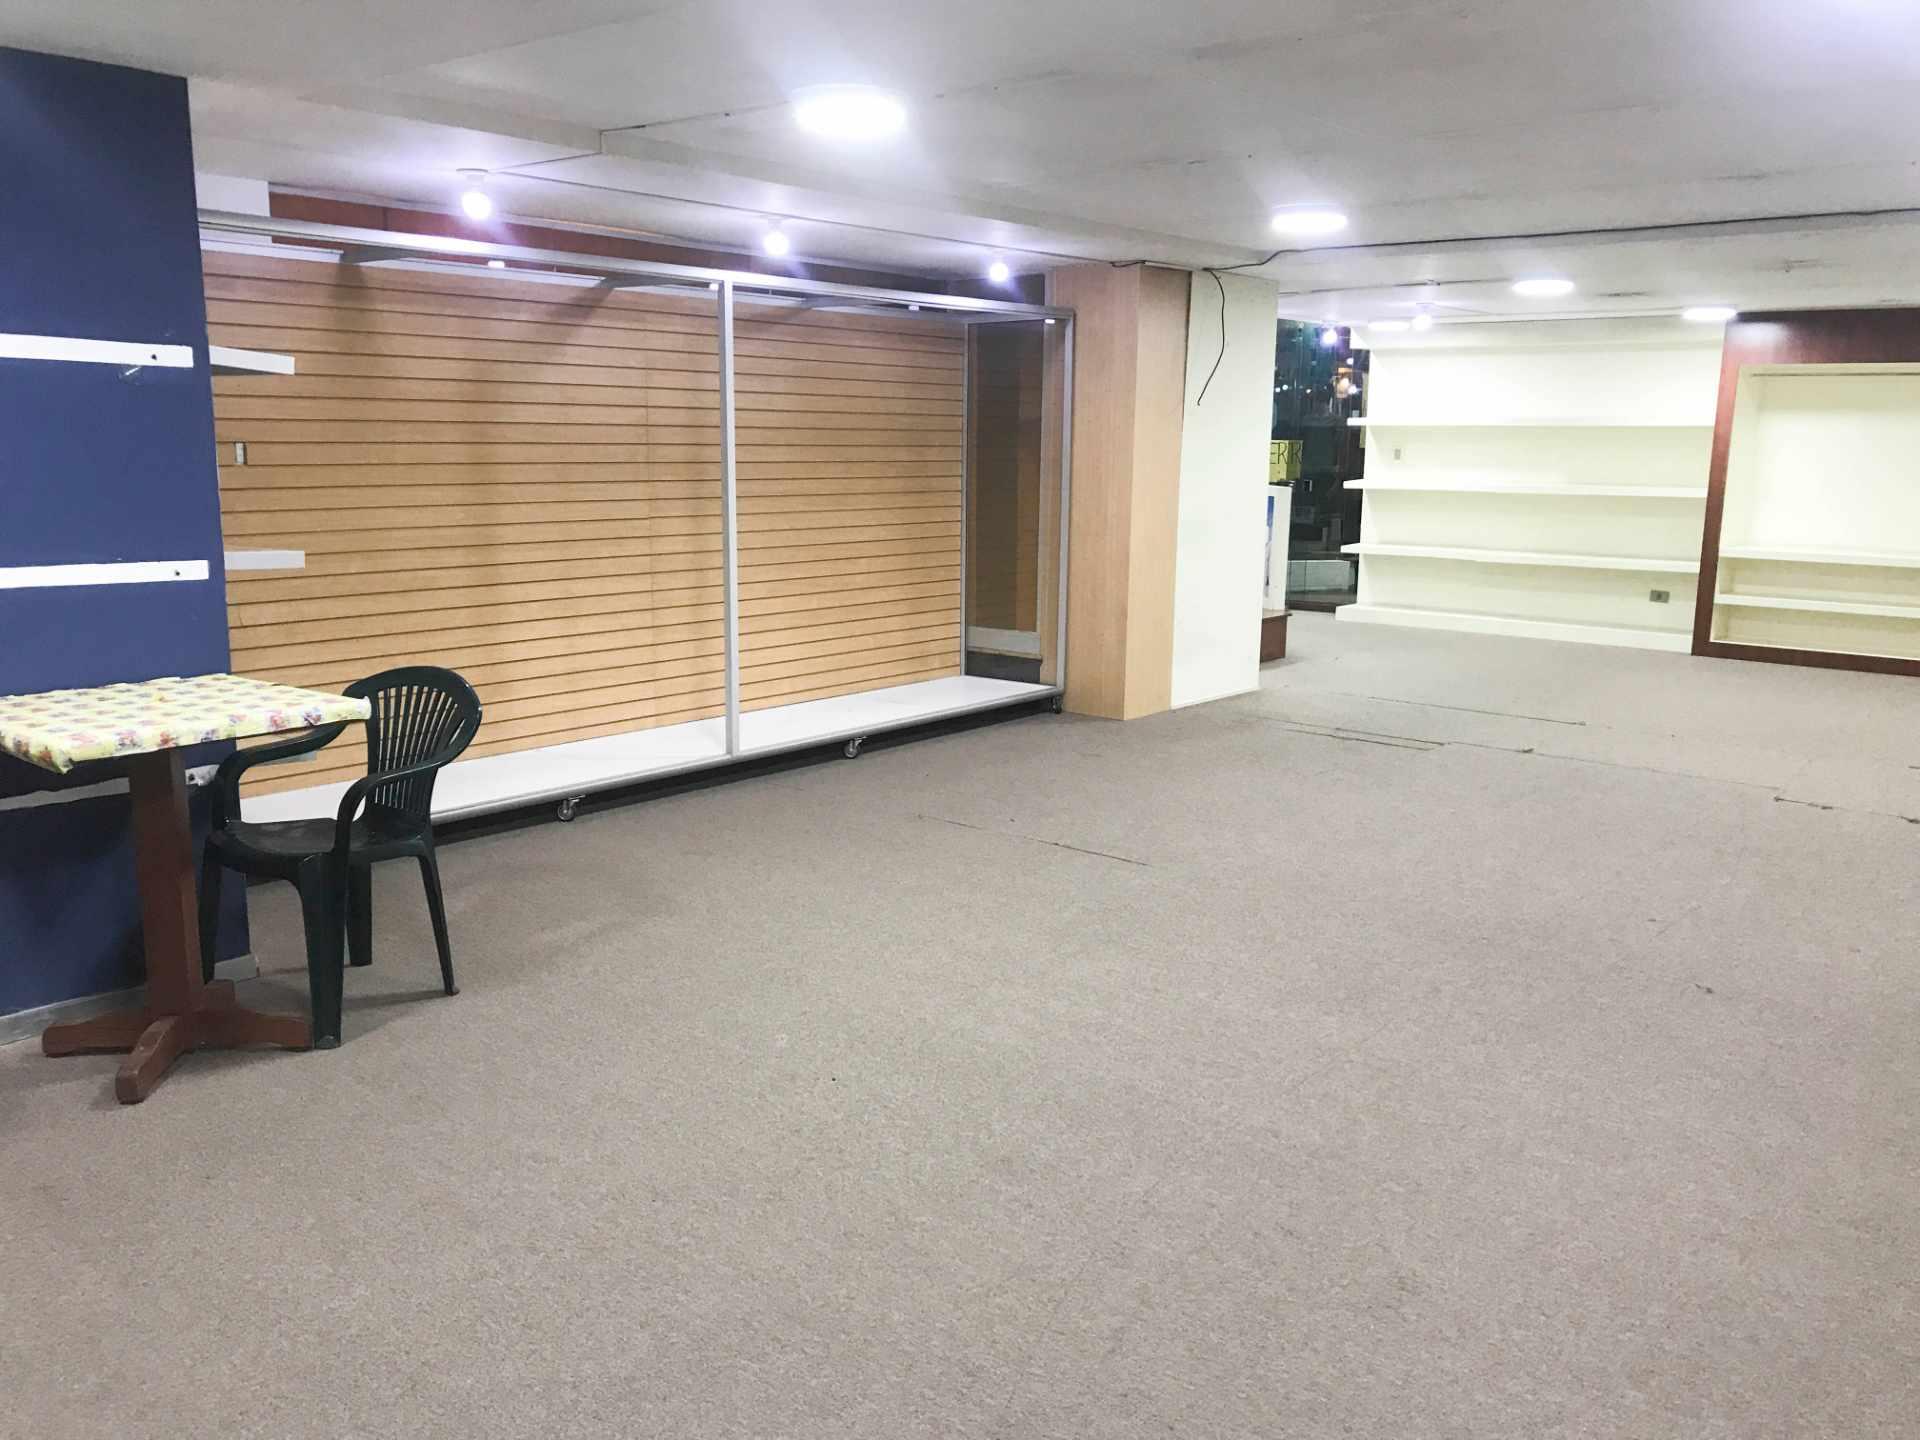 Local comercial en Alquiler Av. Oquendo Torres Sofer Planta Baja Foto 2